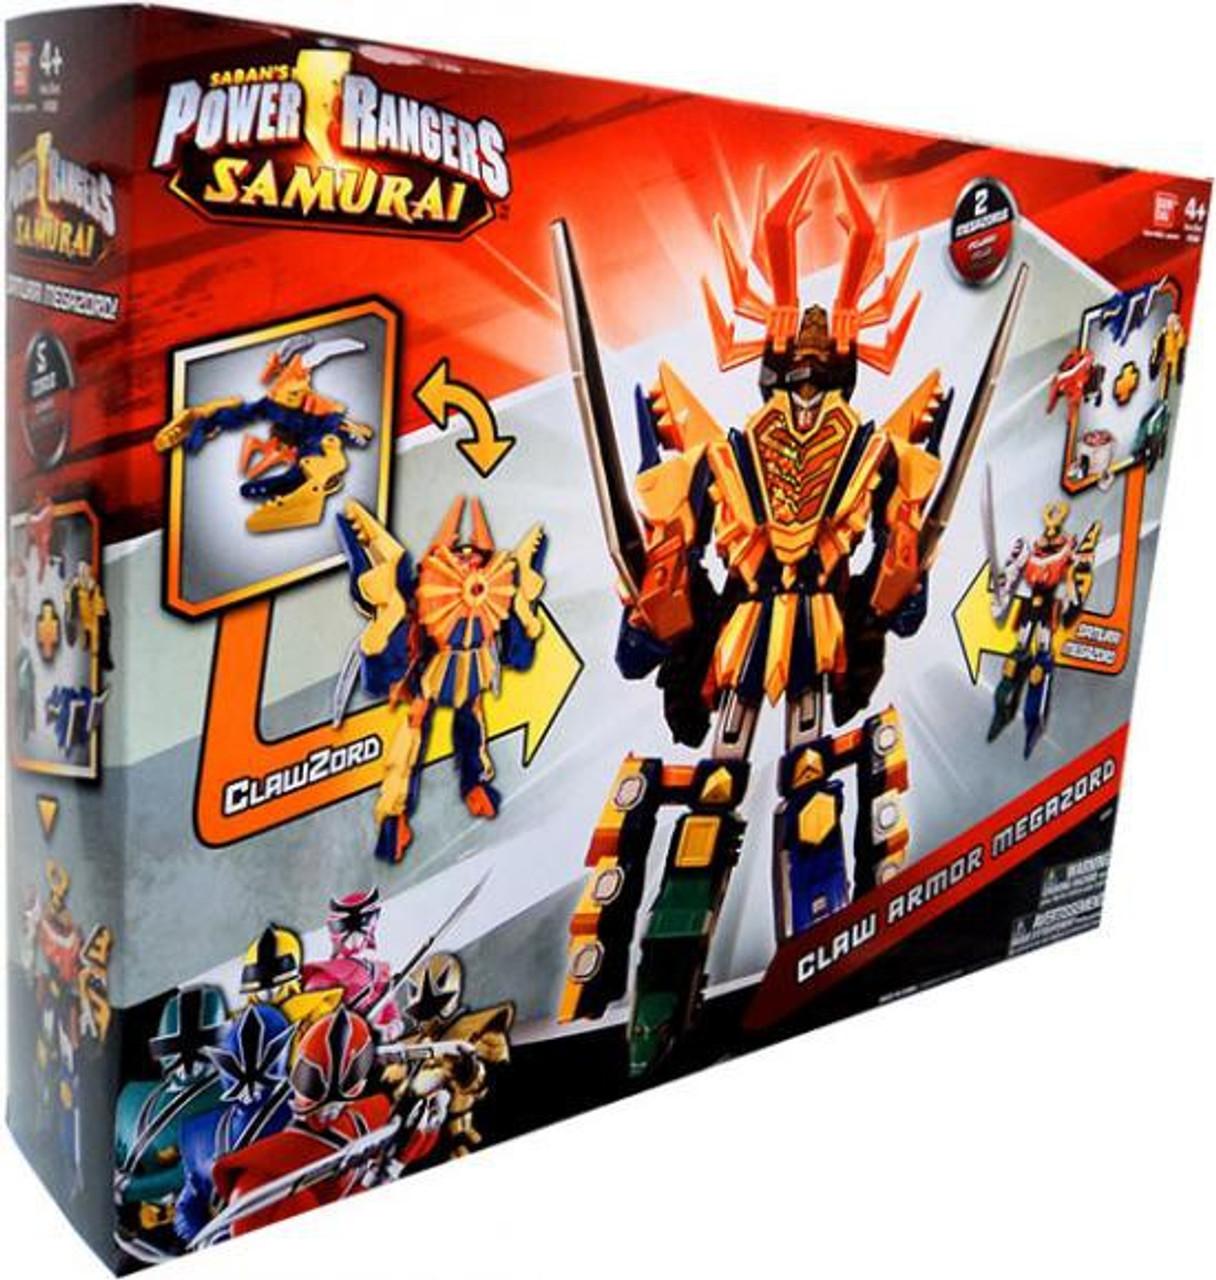 Power Rangers Samurai Deluxe DX Claw Armor Megazord Action Figure